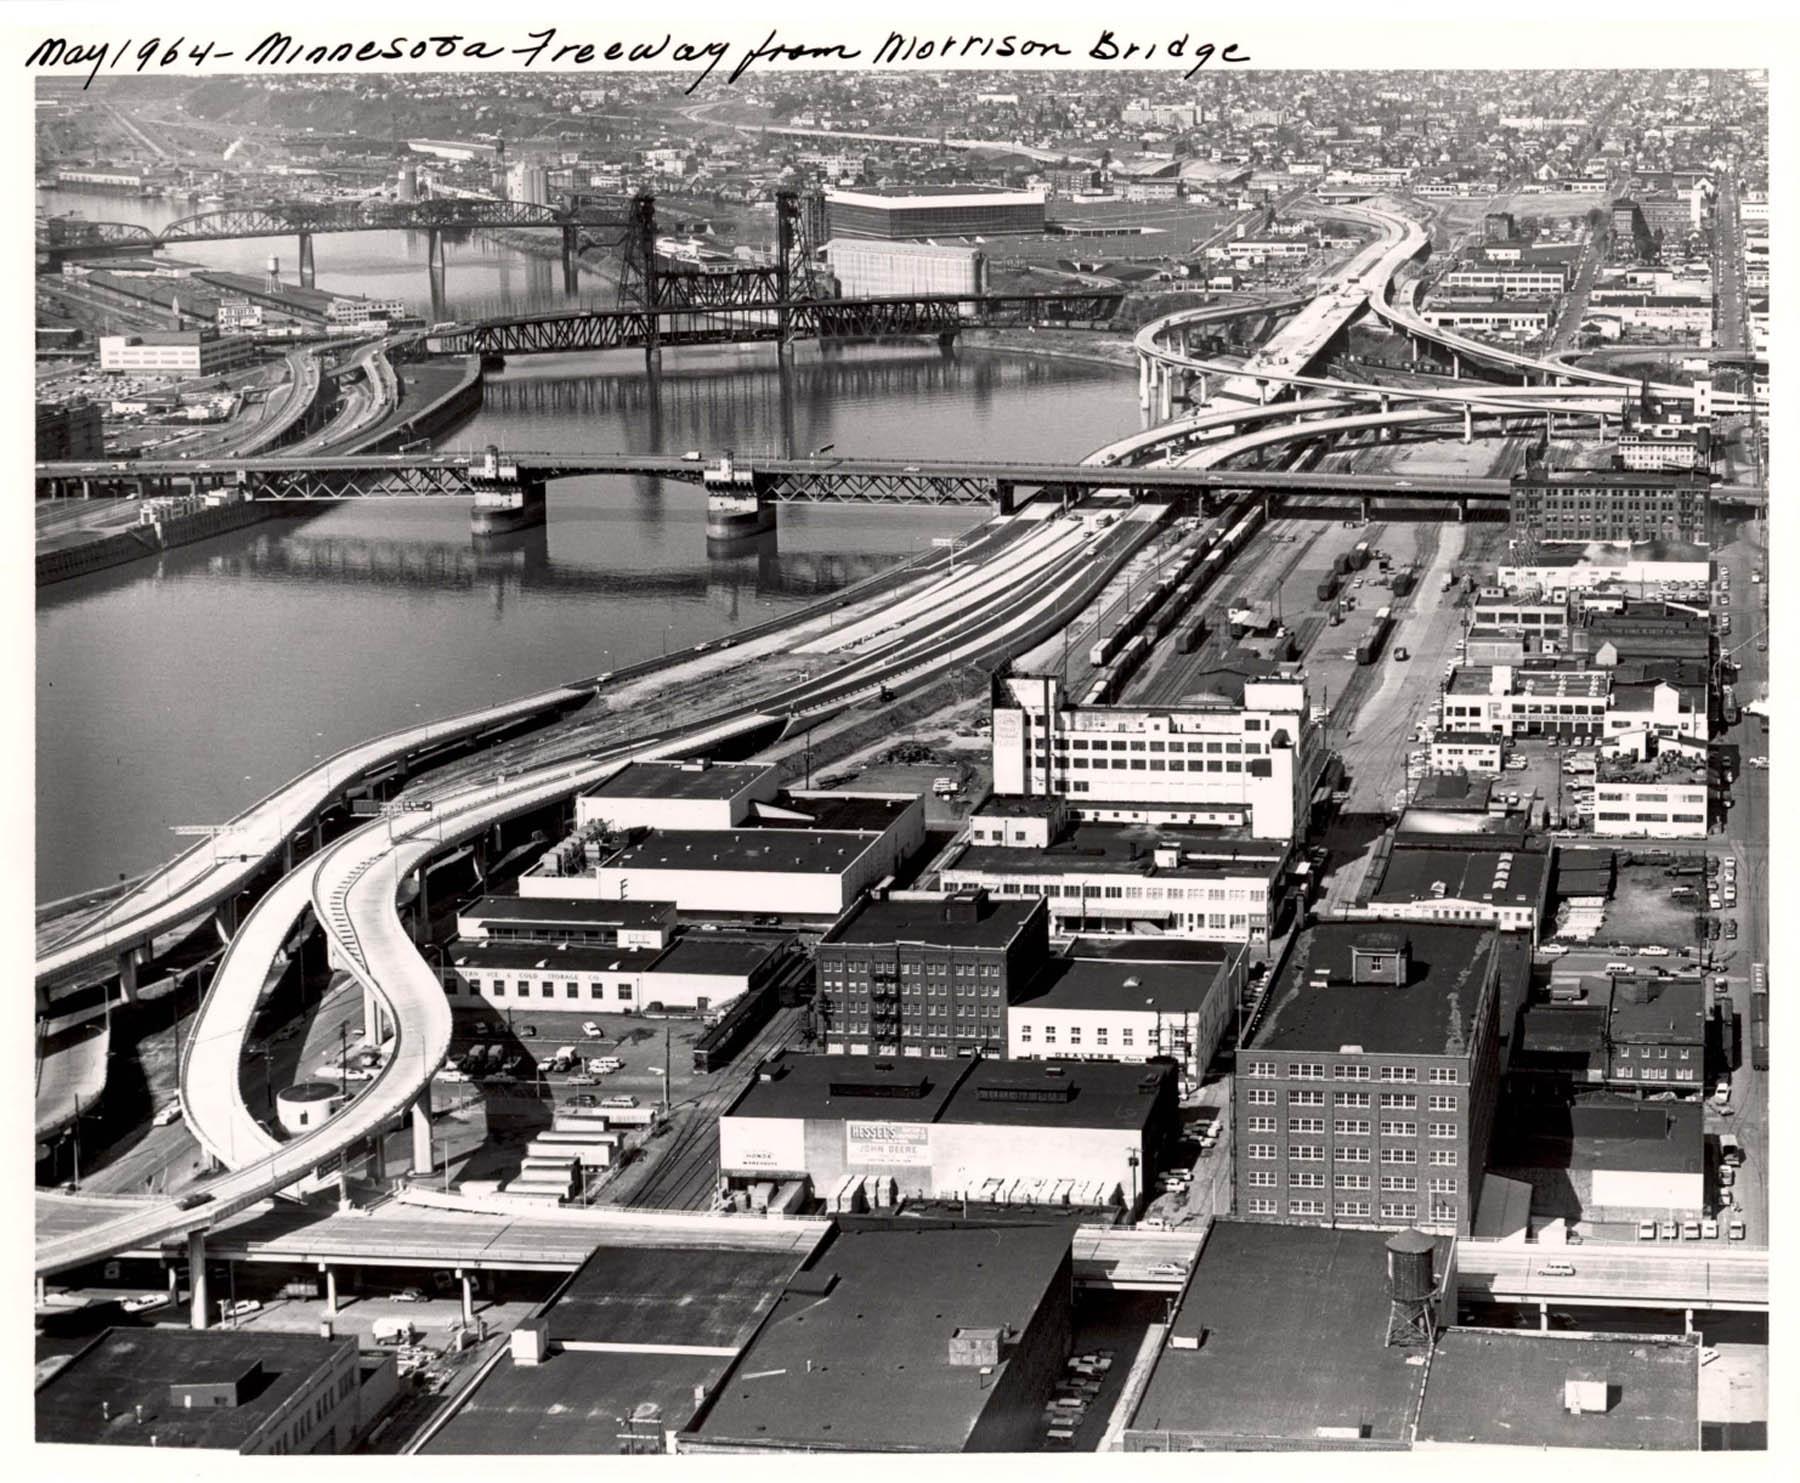 A2005-001.428 Minnesota Freeway from Morrison Bridge north 1964